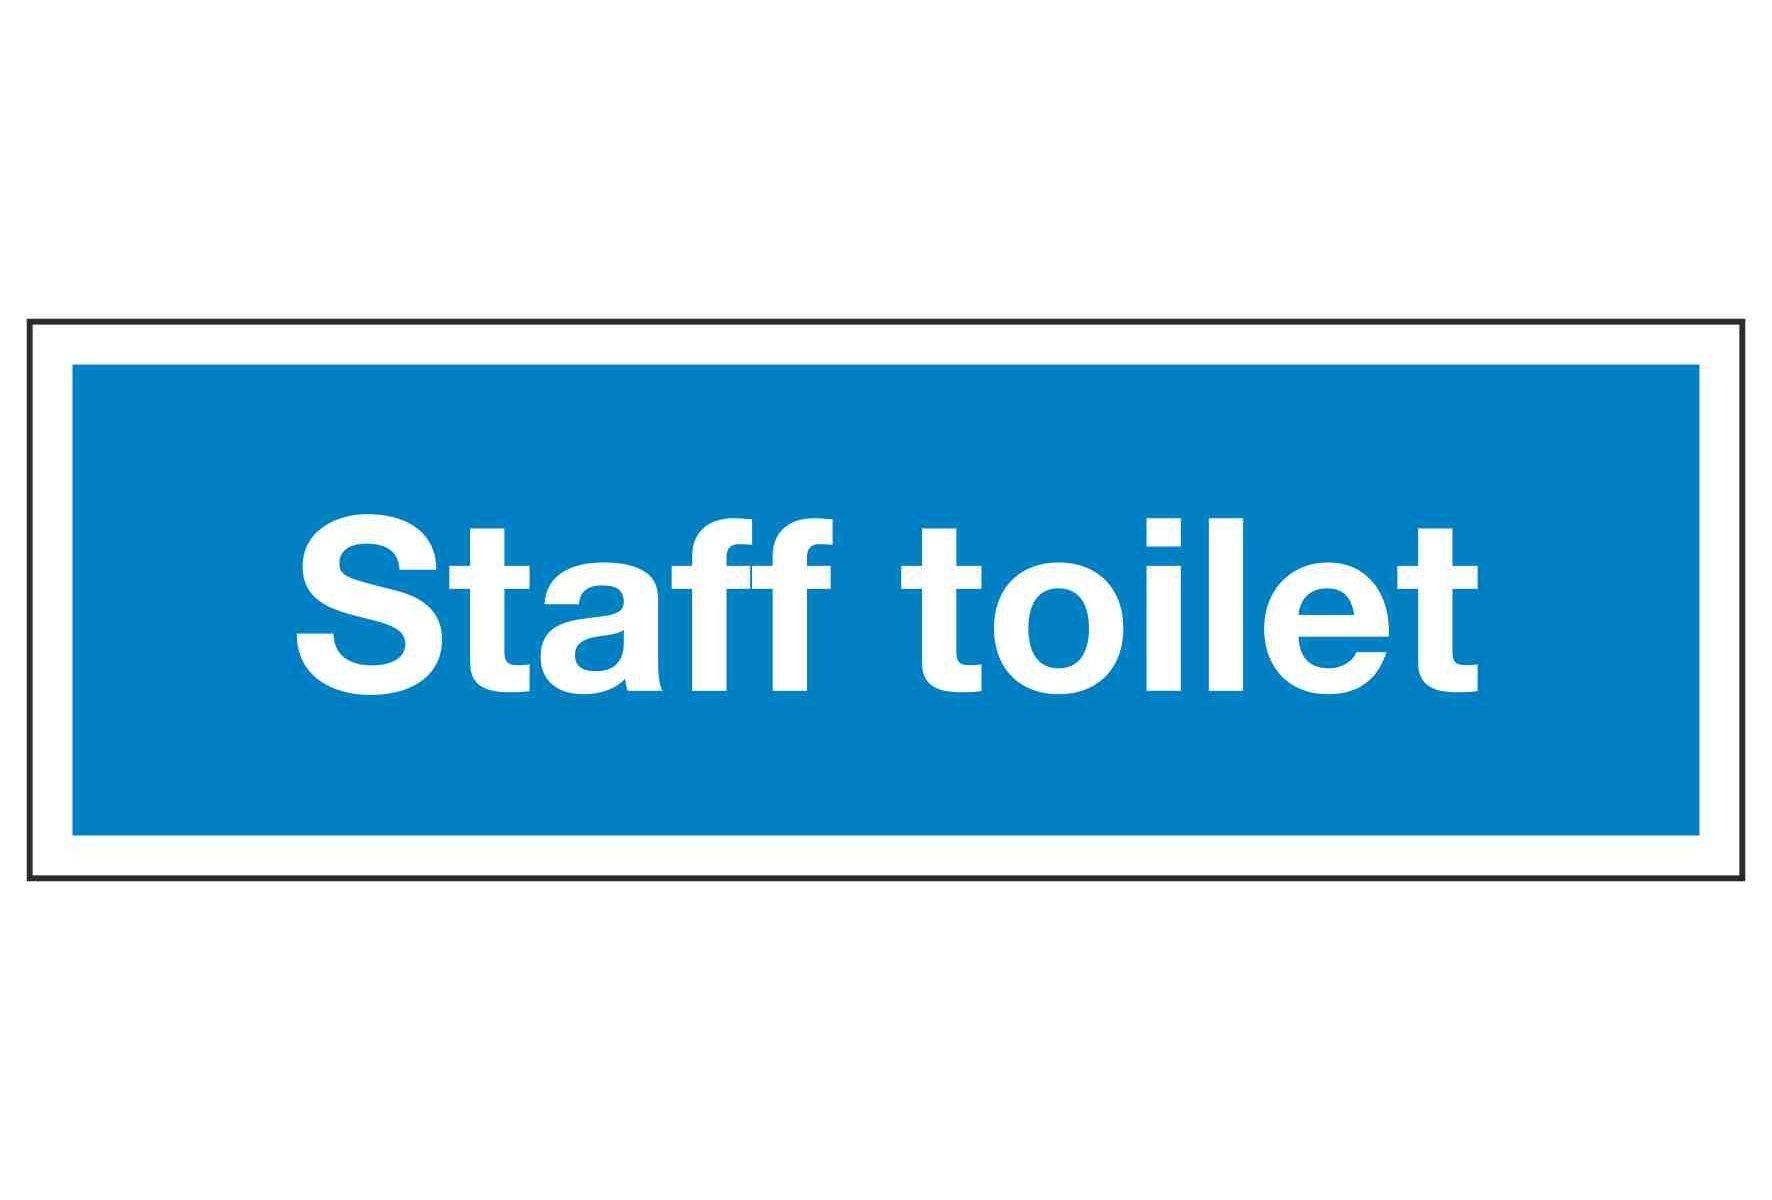 Staff toilet